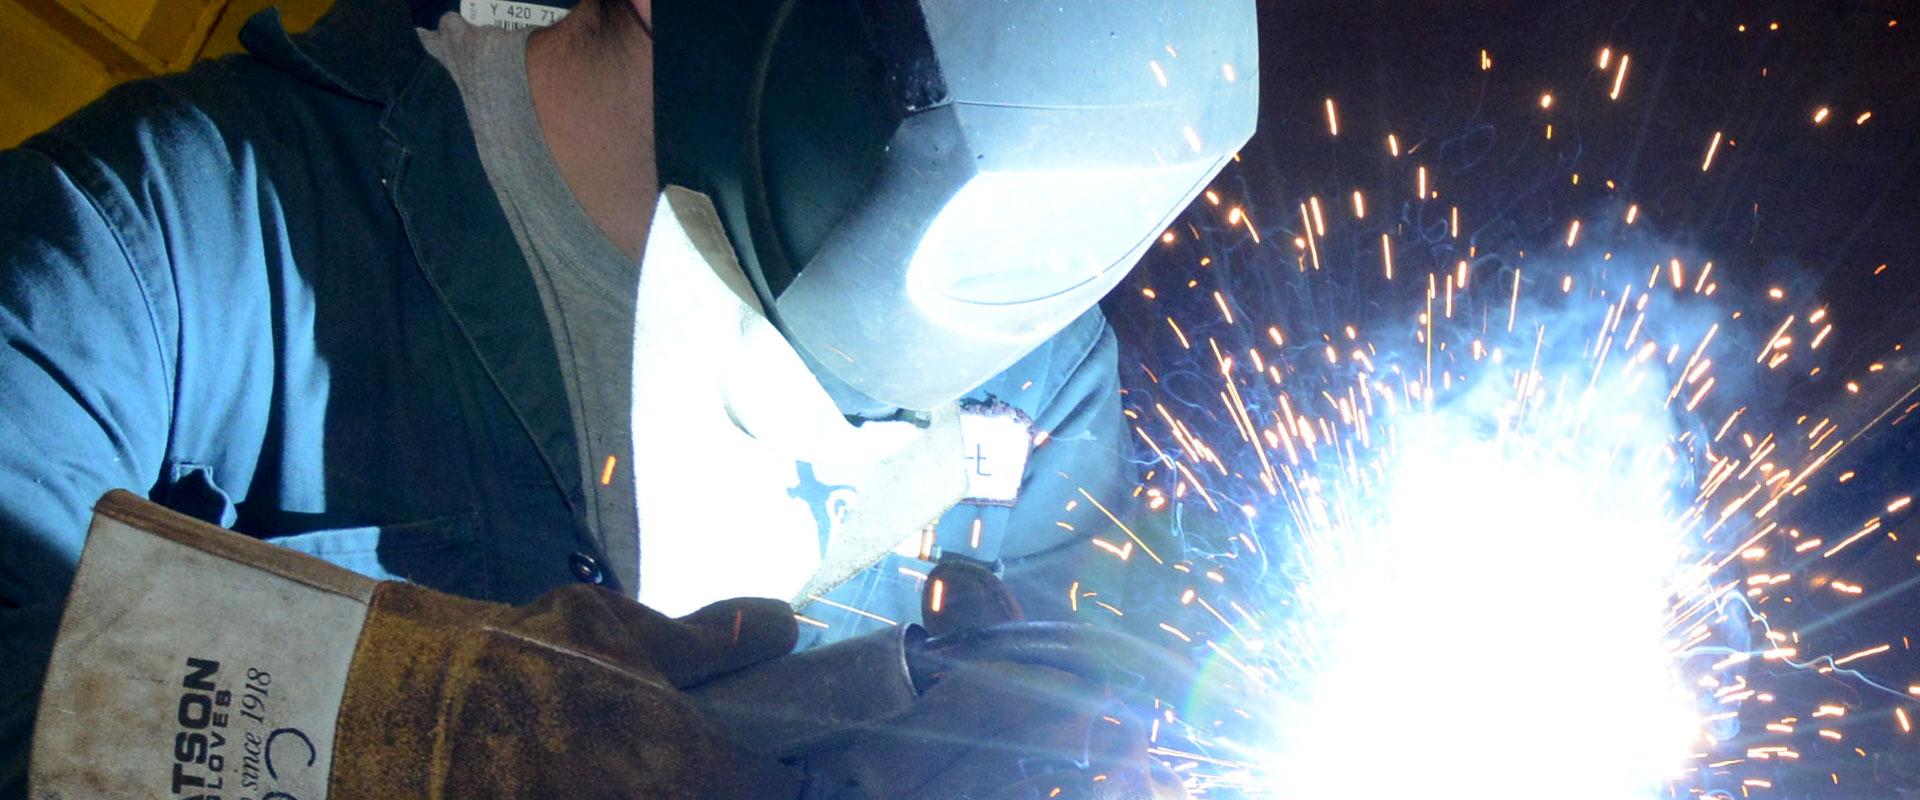 imcp industrial maintenance canada